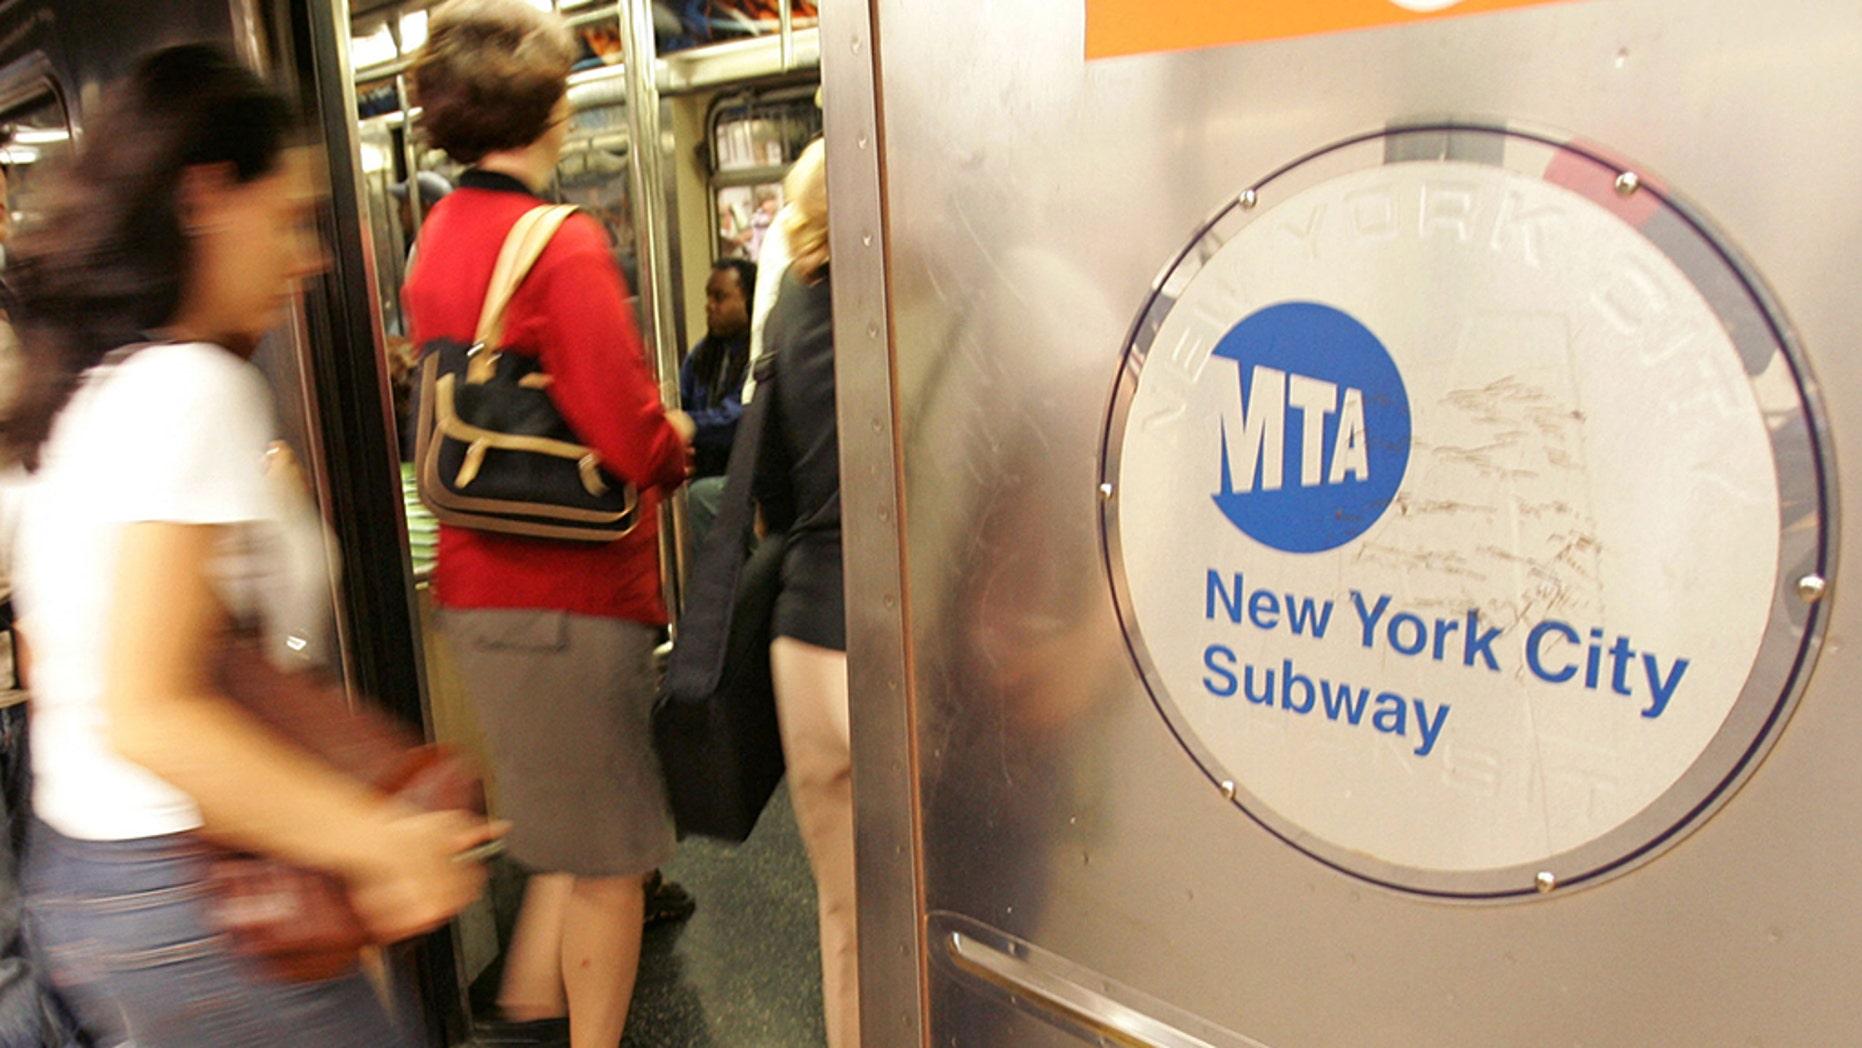 Riders board a subway train in New York City.